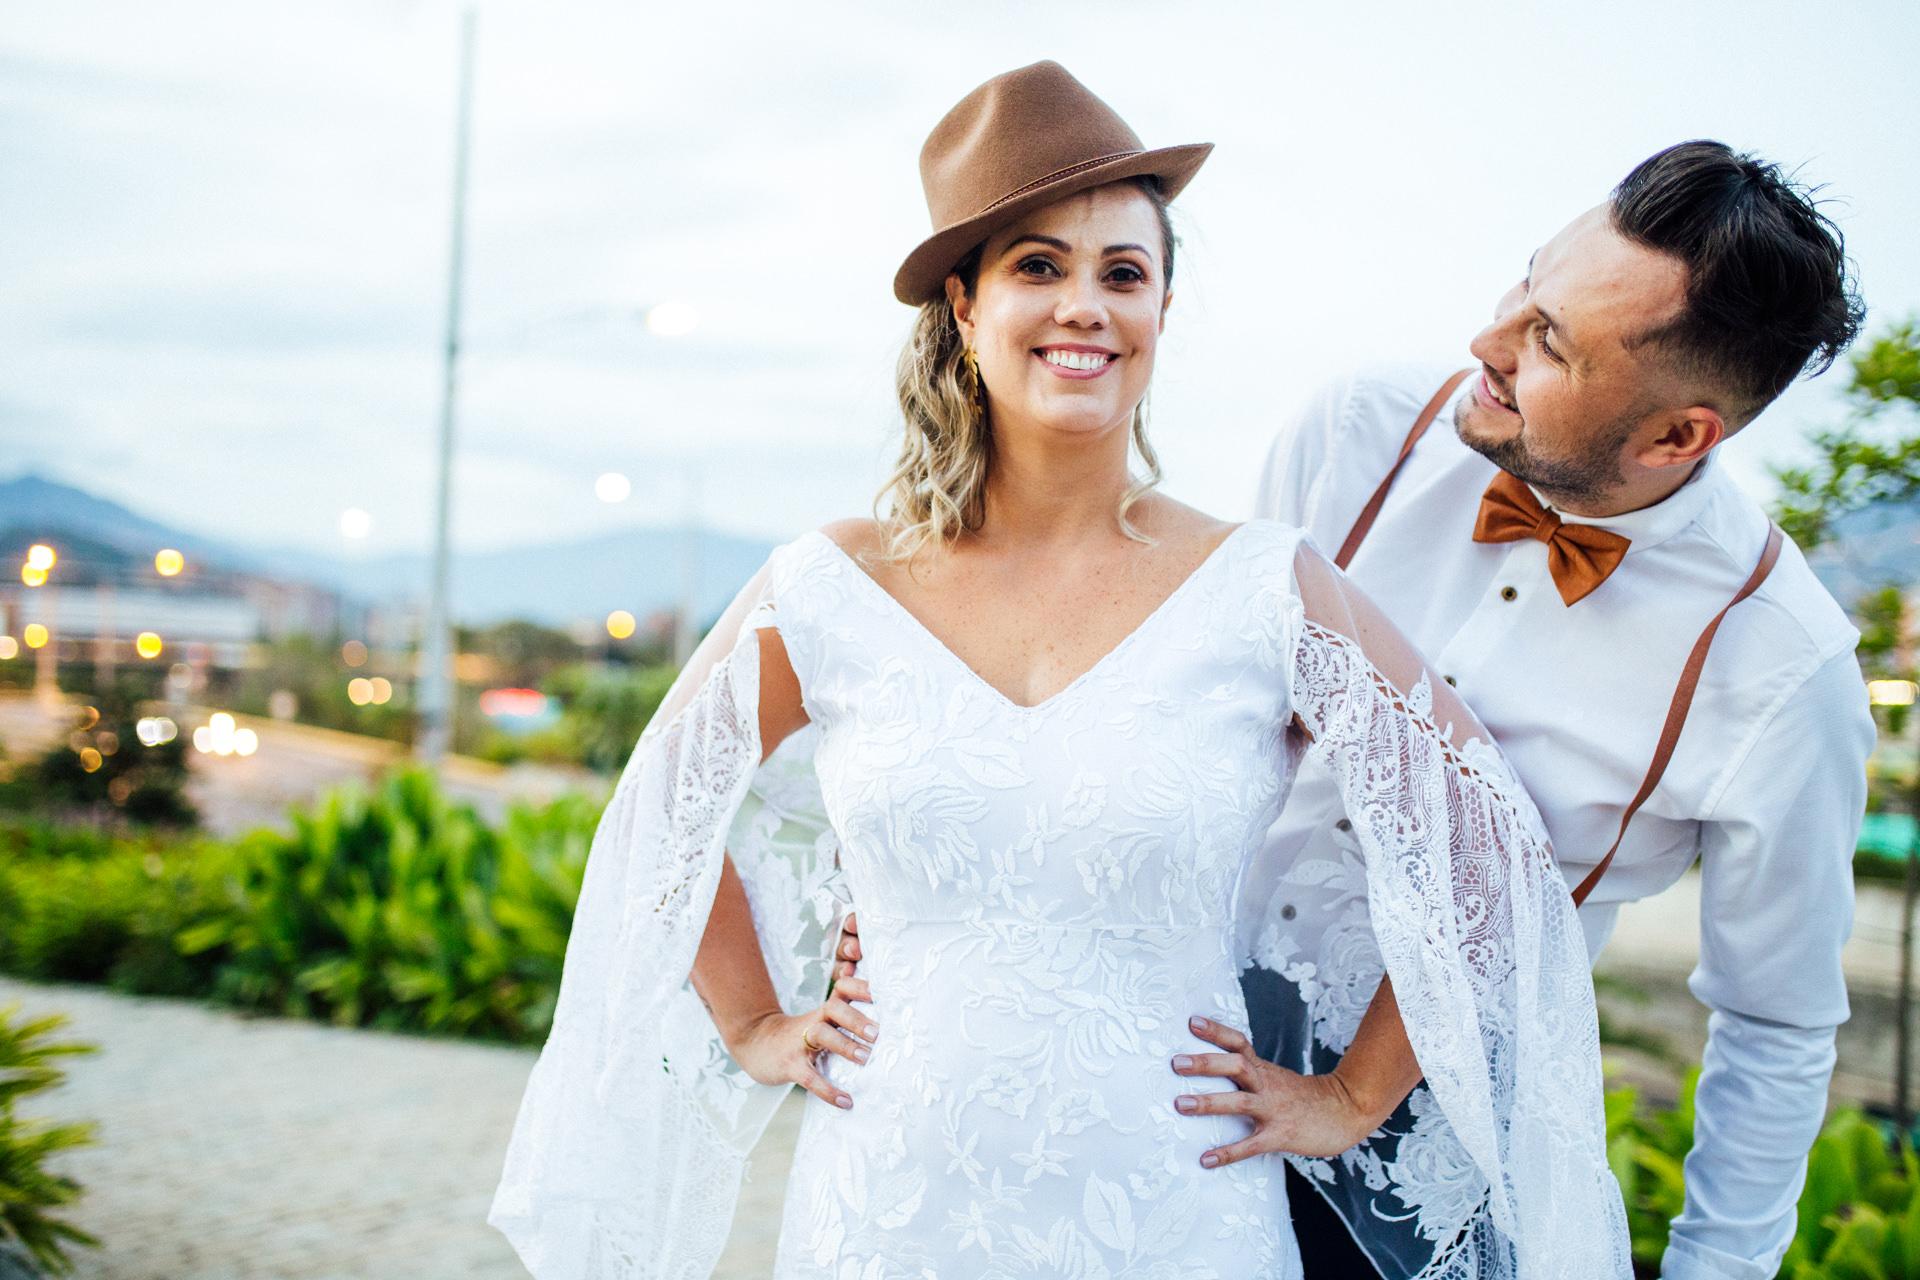 Wedding-Boda-Matrimonio-Fotografo-Fotografia-bodas-Medellin-Llanogrande-Colombia-Bogota-Cartagena-Miami-Wed-Destination-Photojournalism (190).JPG